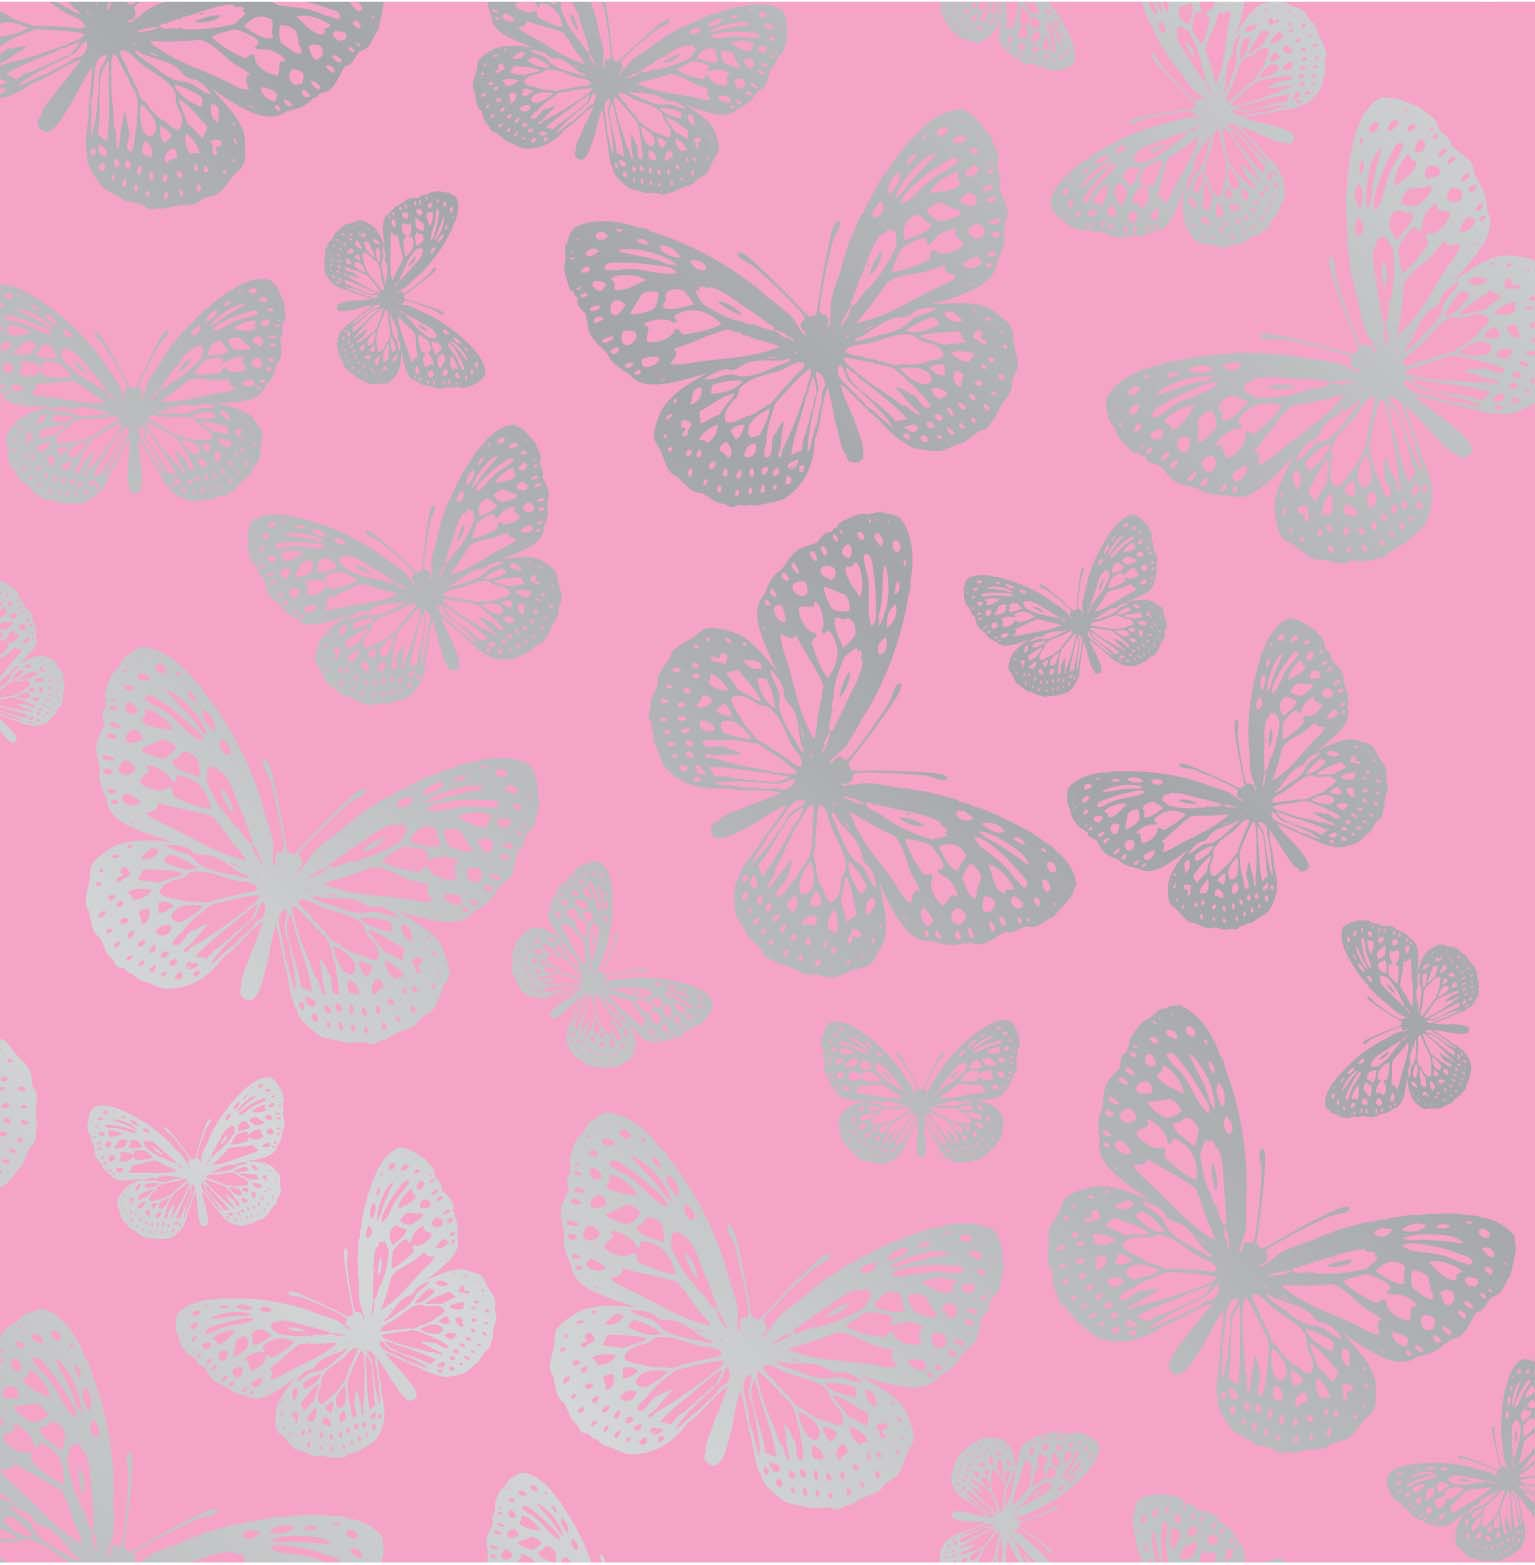 Pink Butterfly Wallpaper: Fine Decor Fun4Walls Butterfly Wallpaper